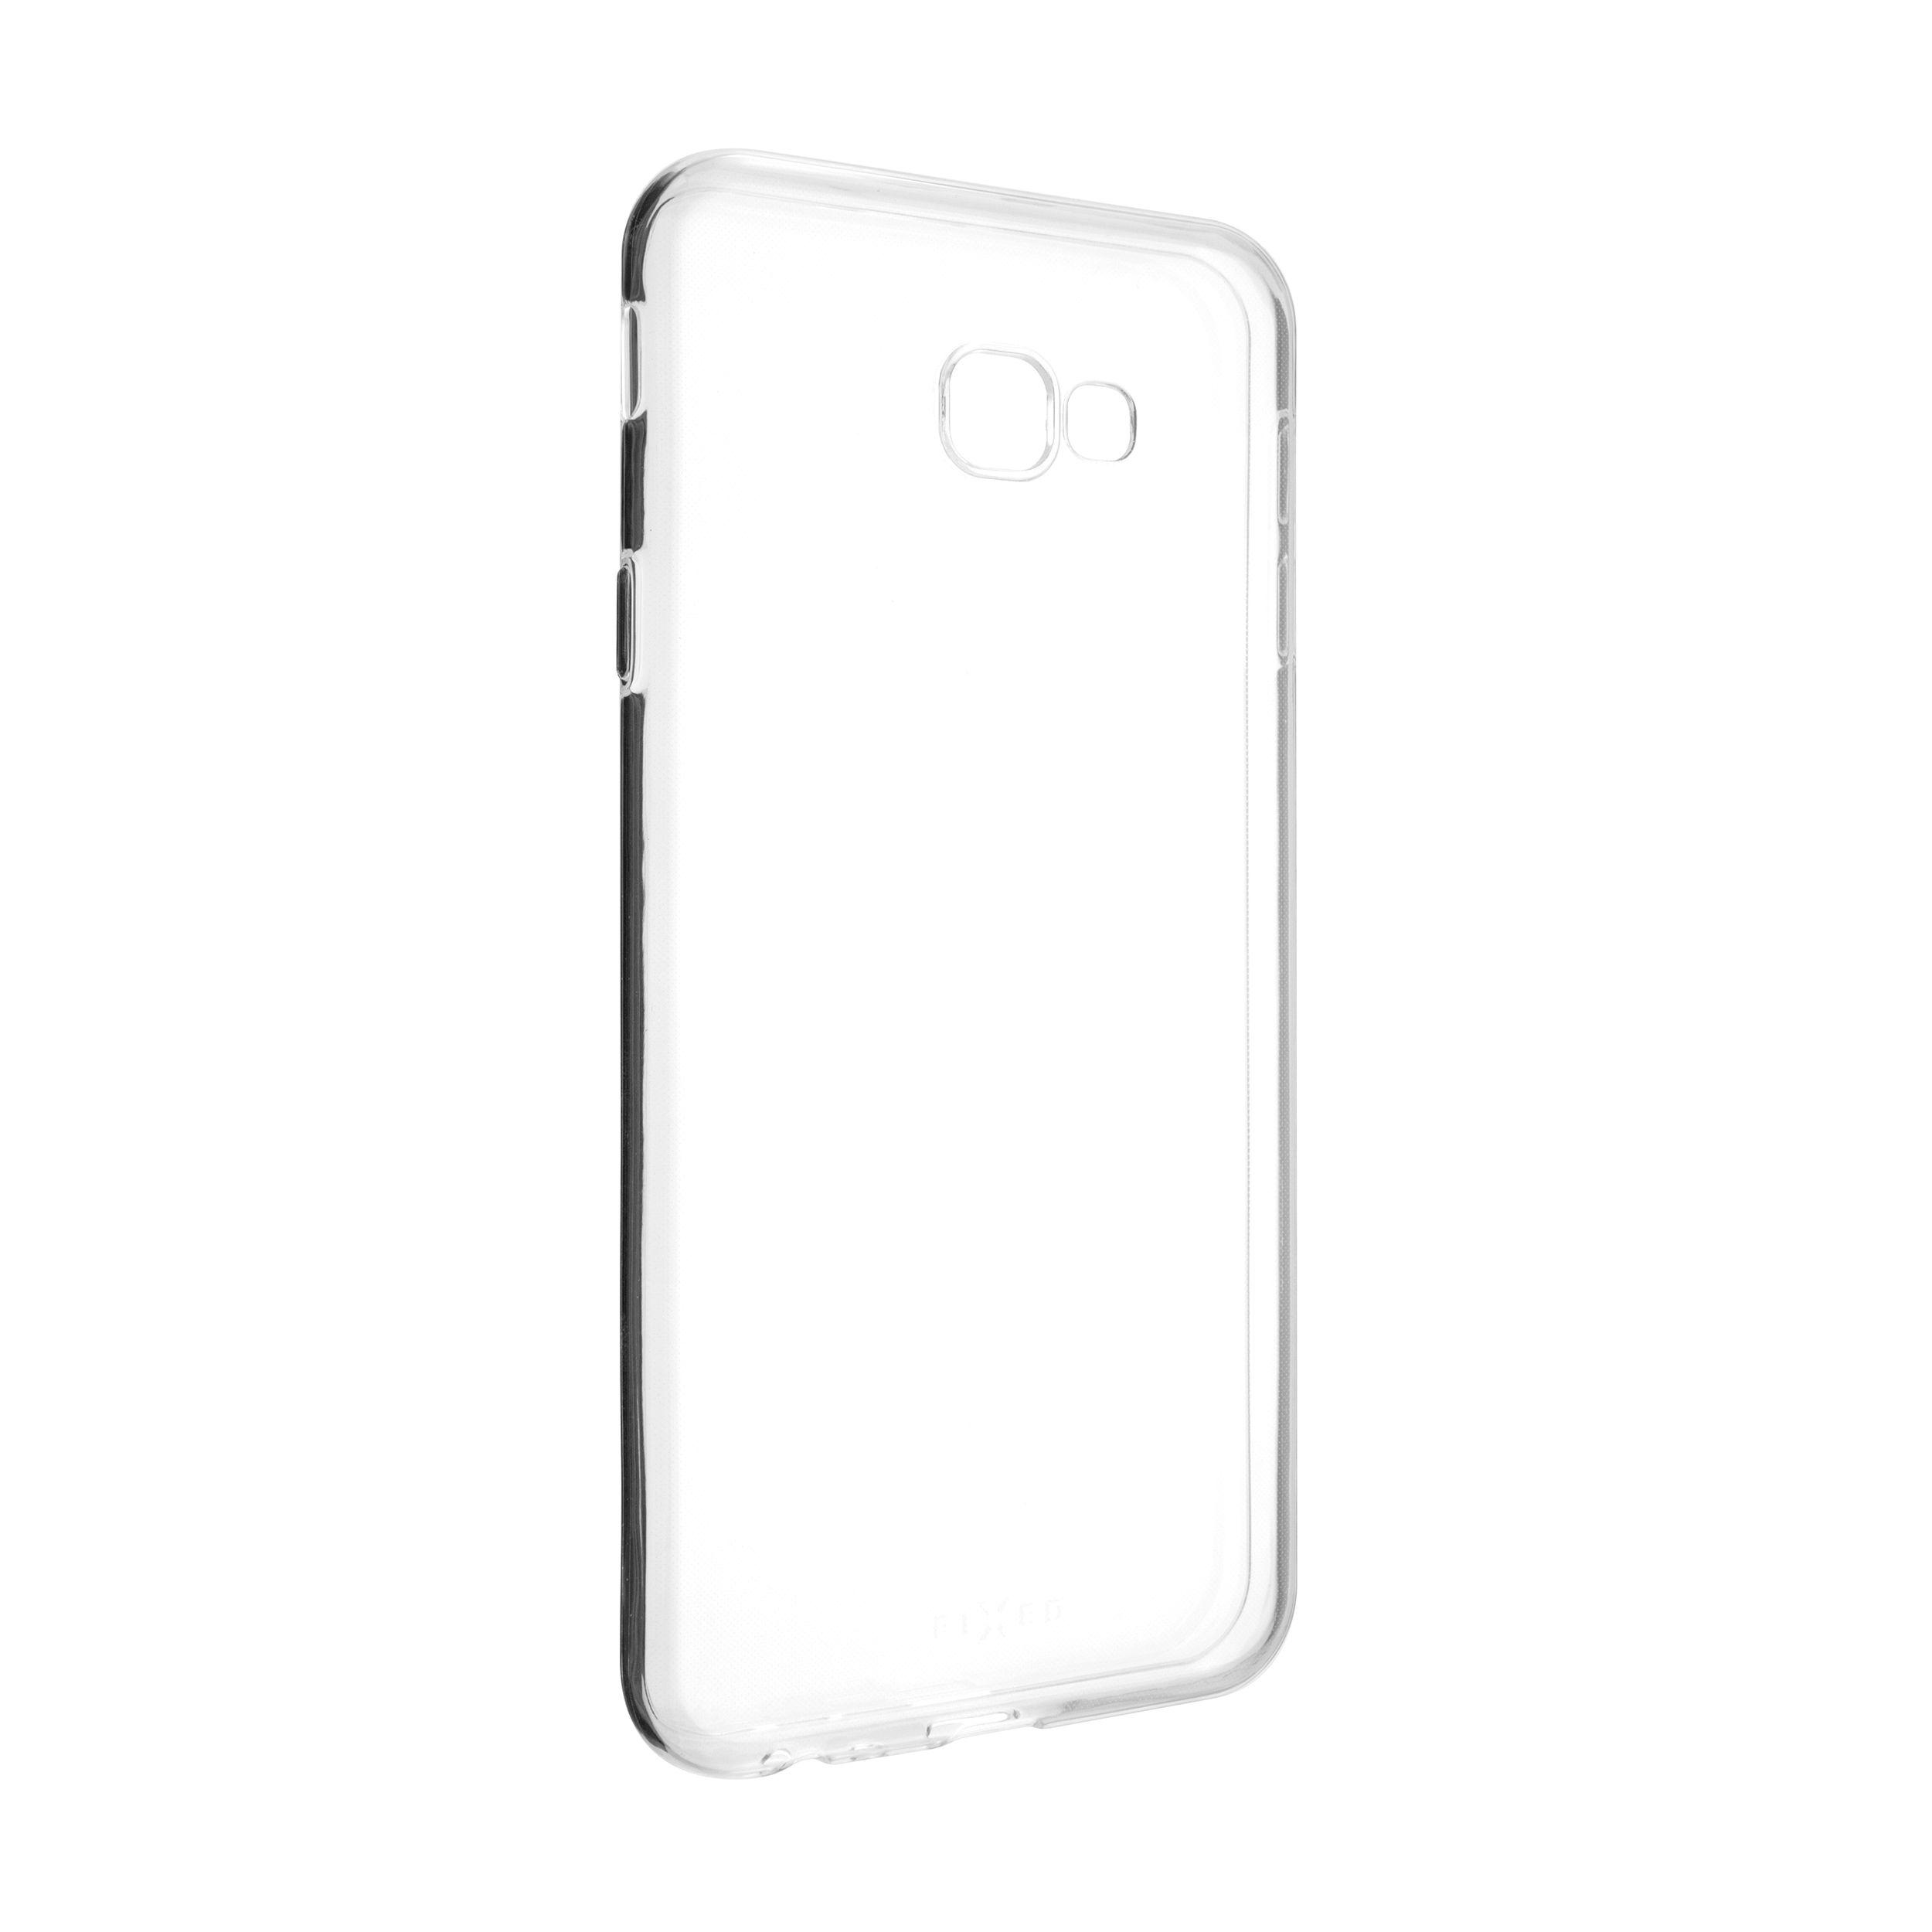 Ultratenké TPU gelové pouzdro FIXED Skin pro Samsung Galaxy J4+, 0,6 mm, čiré